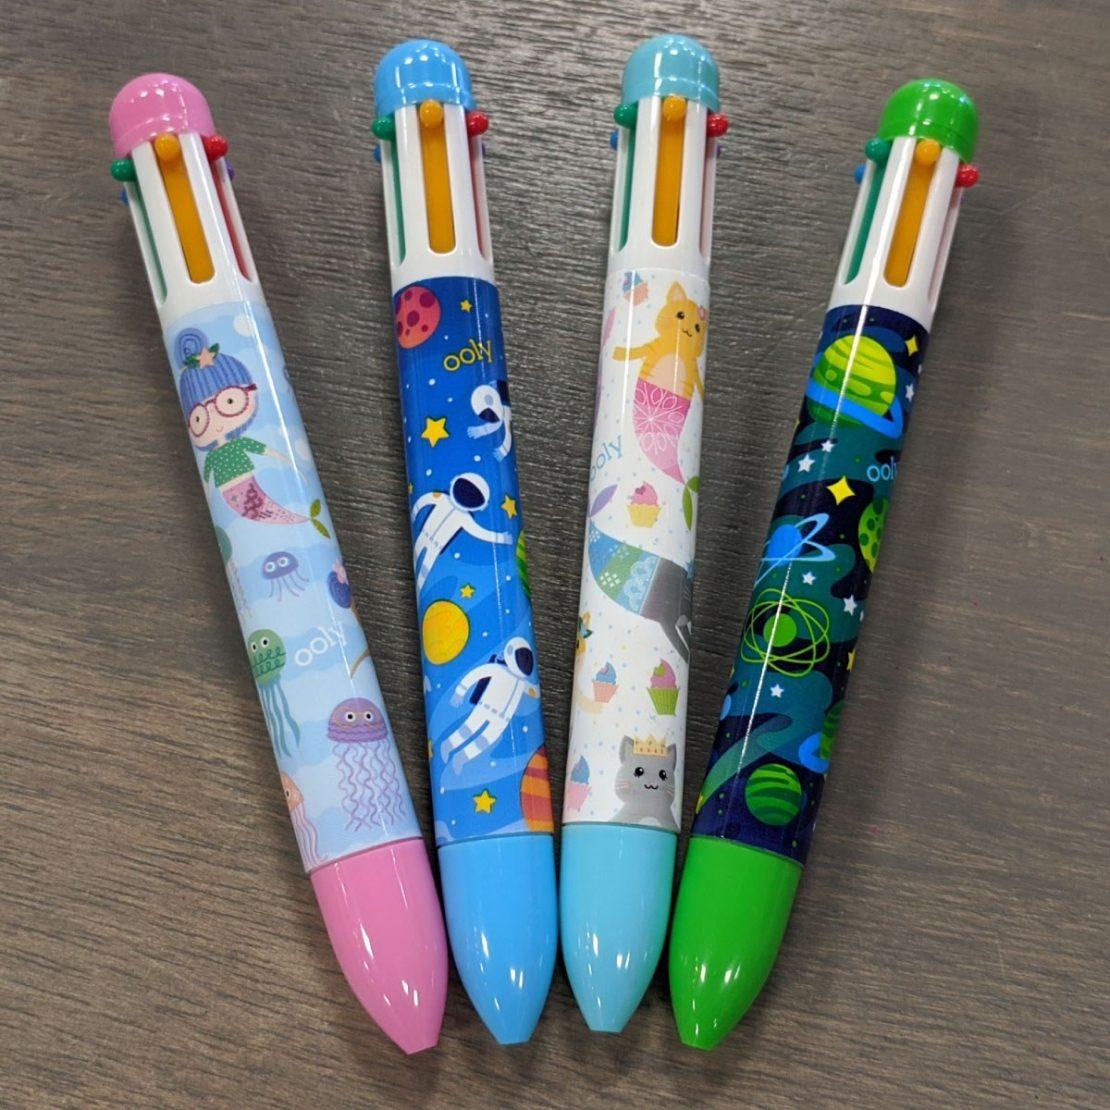 6-Click Ballpoint Pens